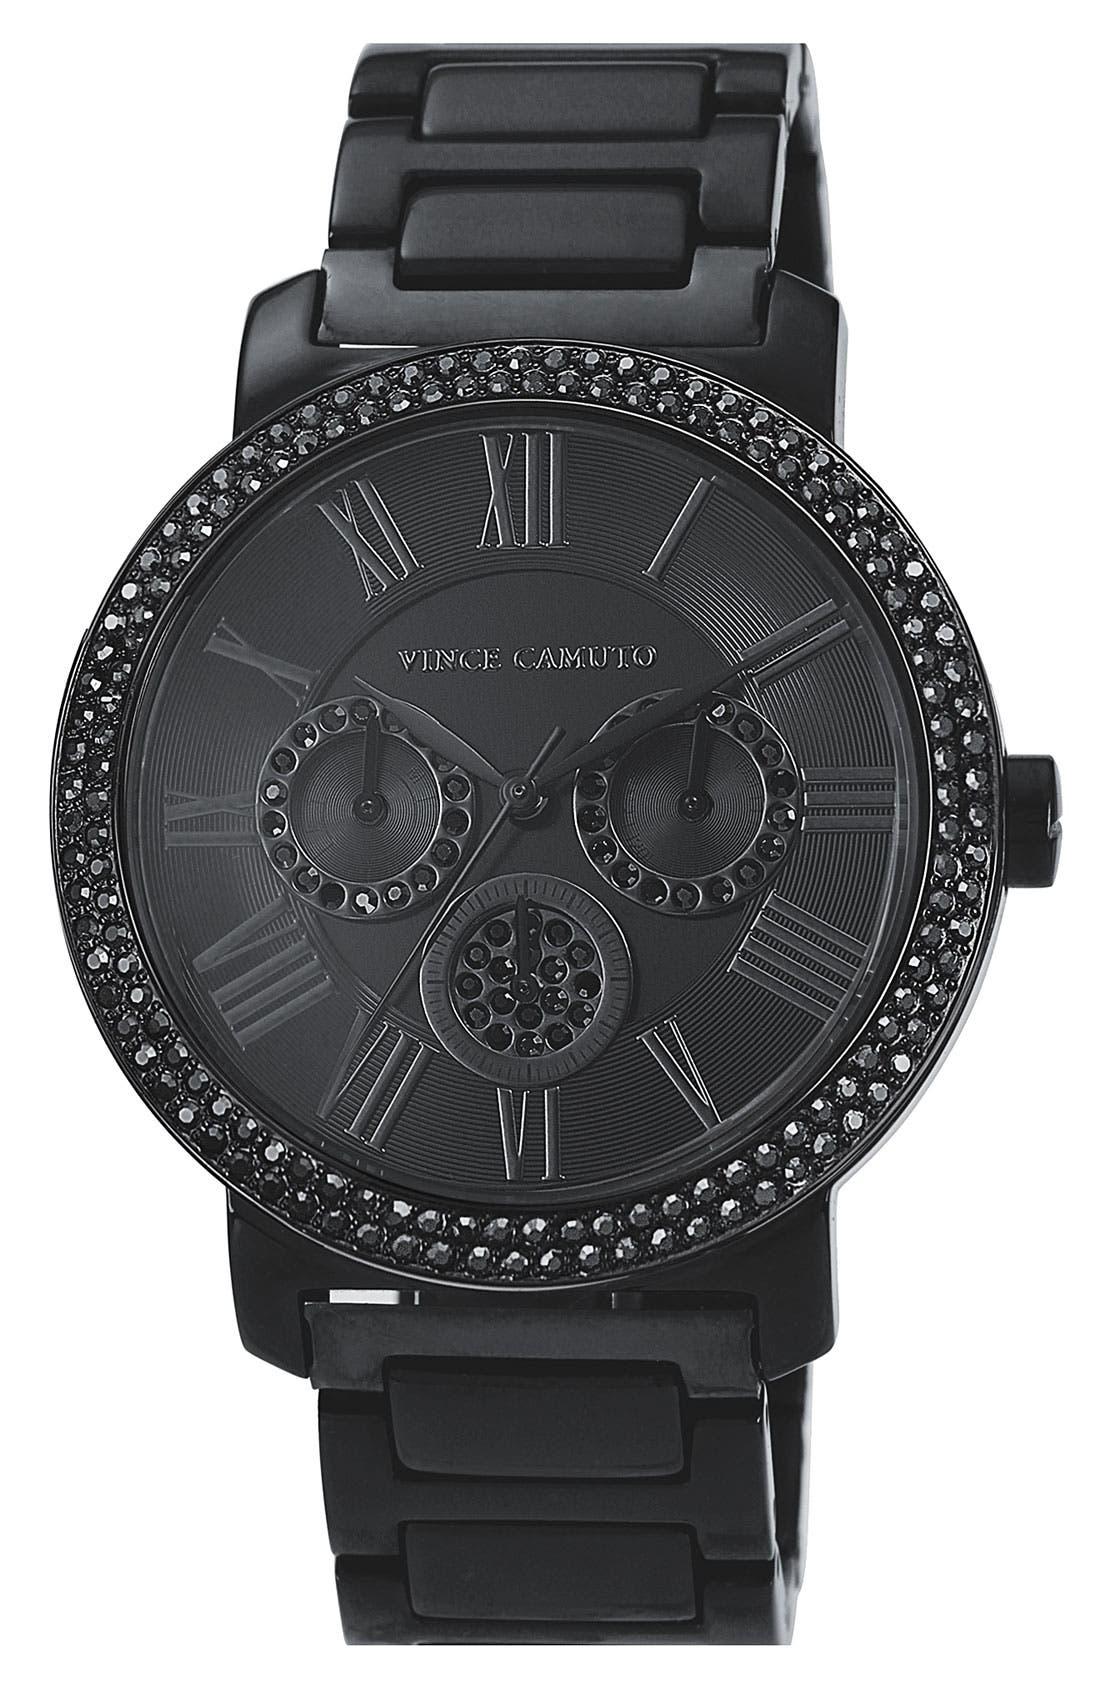 Main Image - Vince Camuto Crystal Bezel Chronograph Bracelet Watch, 42mm